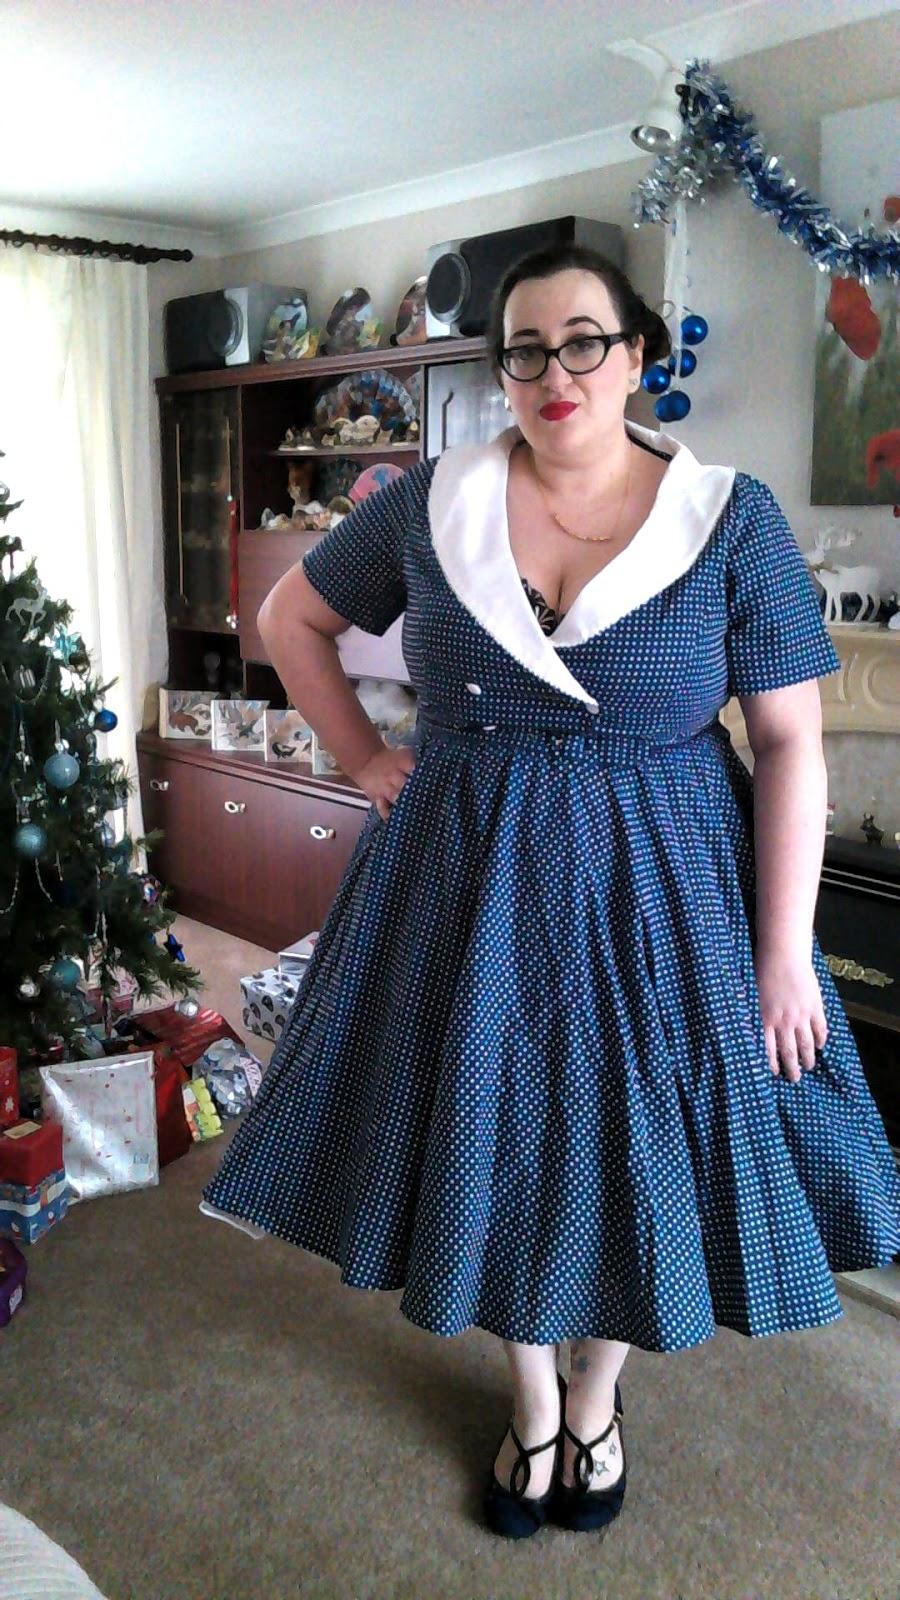 12 Days Of Christmas Dresses #7 - Does My Blog Make Me ...